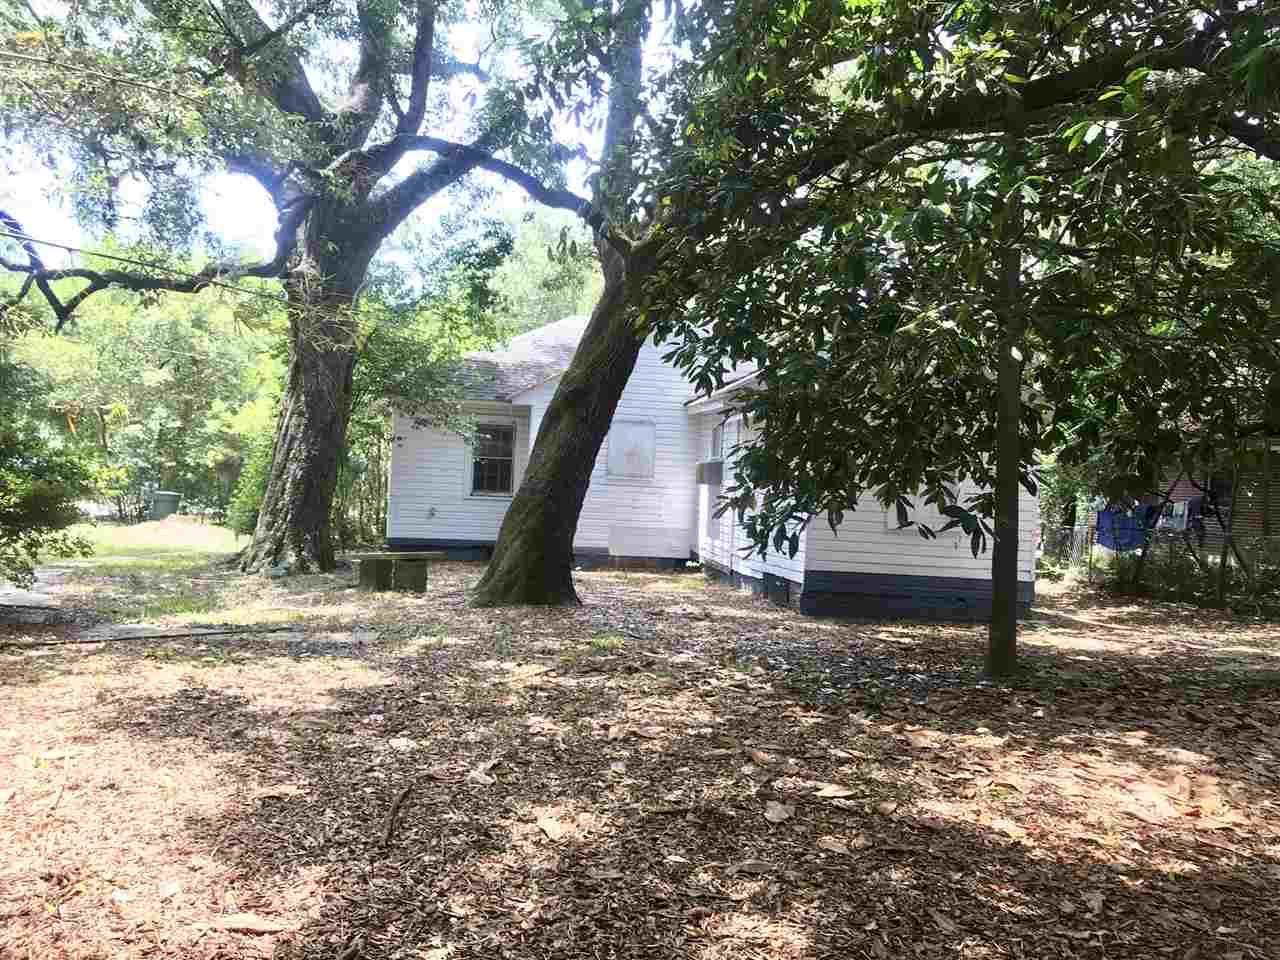 208 W Winthrop Ave, Pensacola, FL 32507